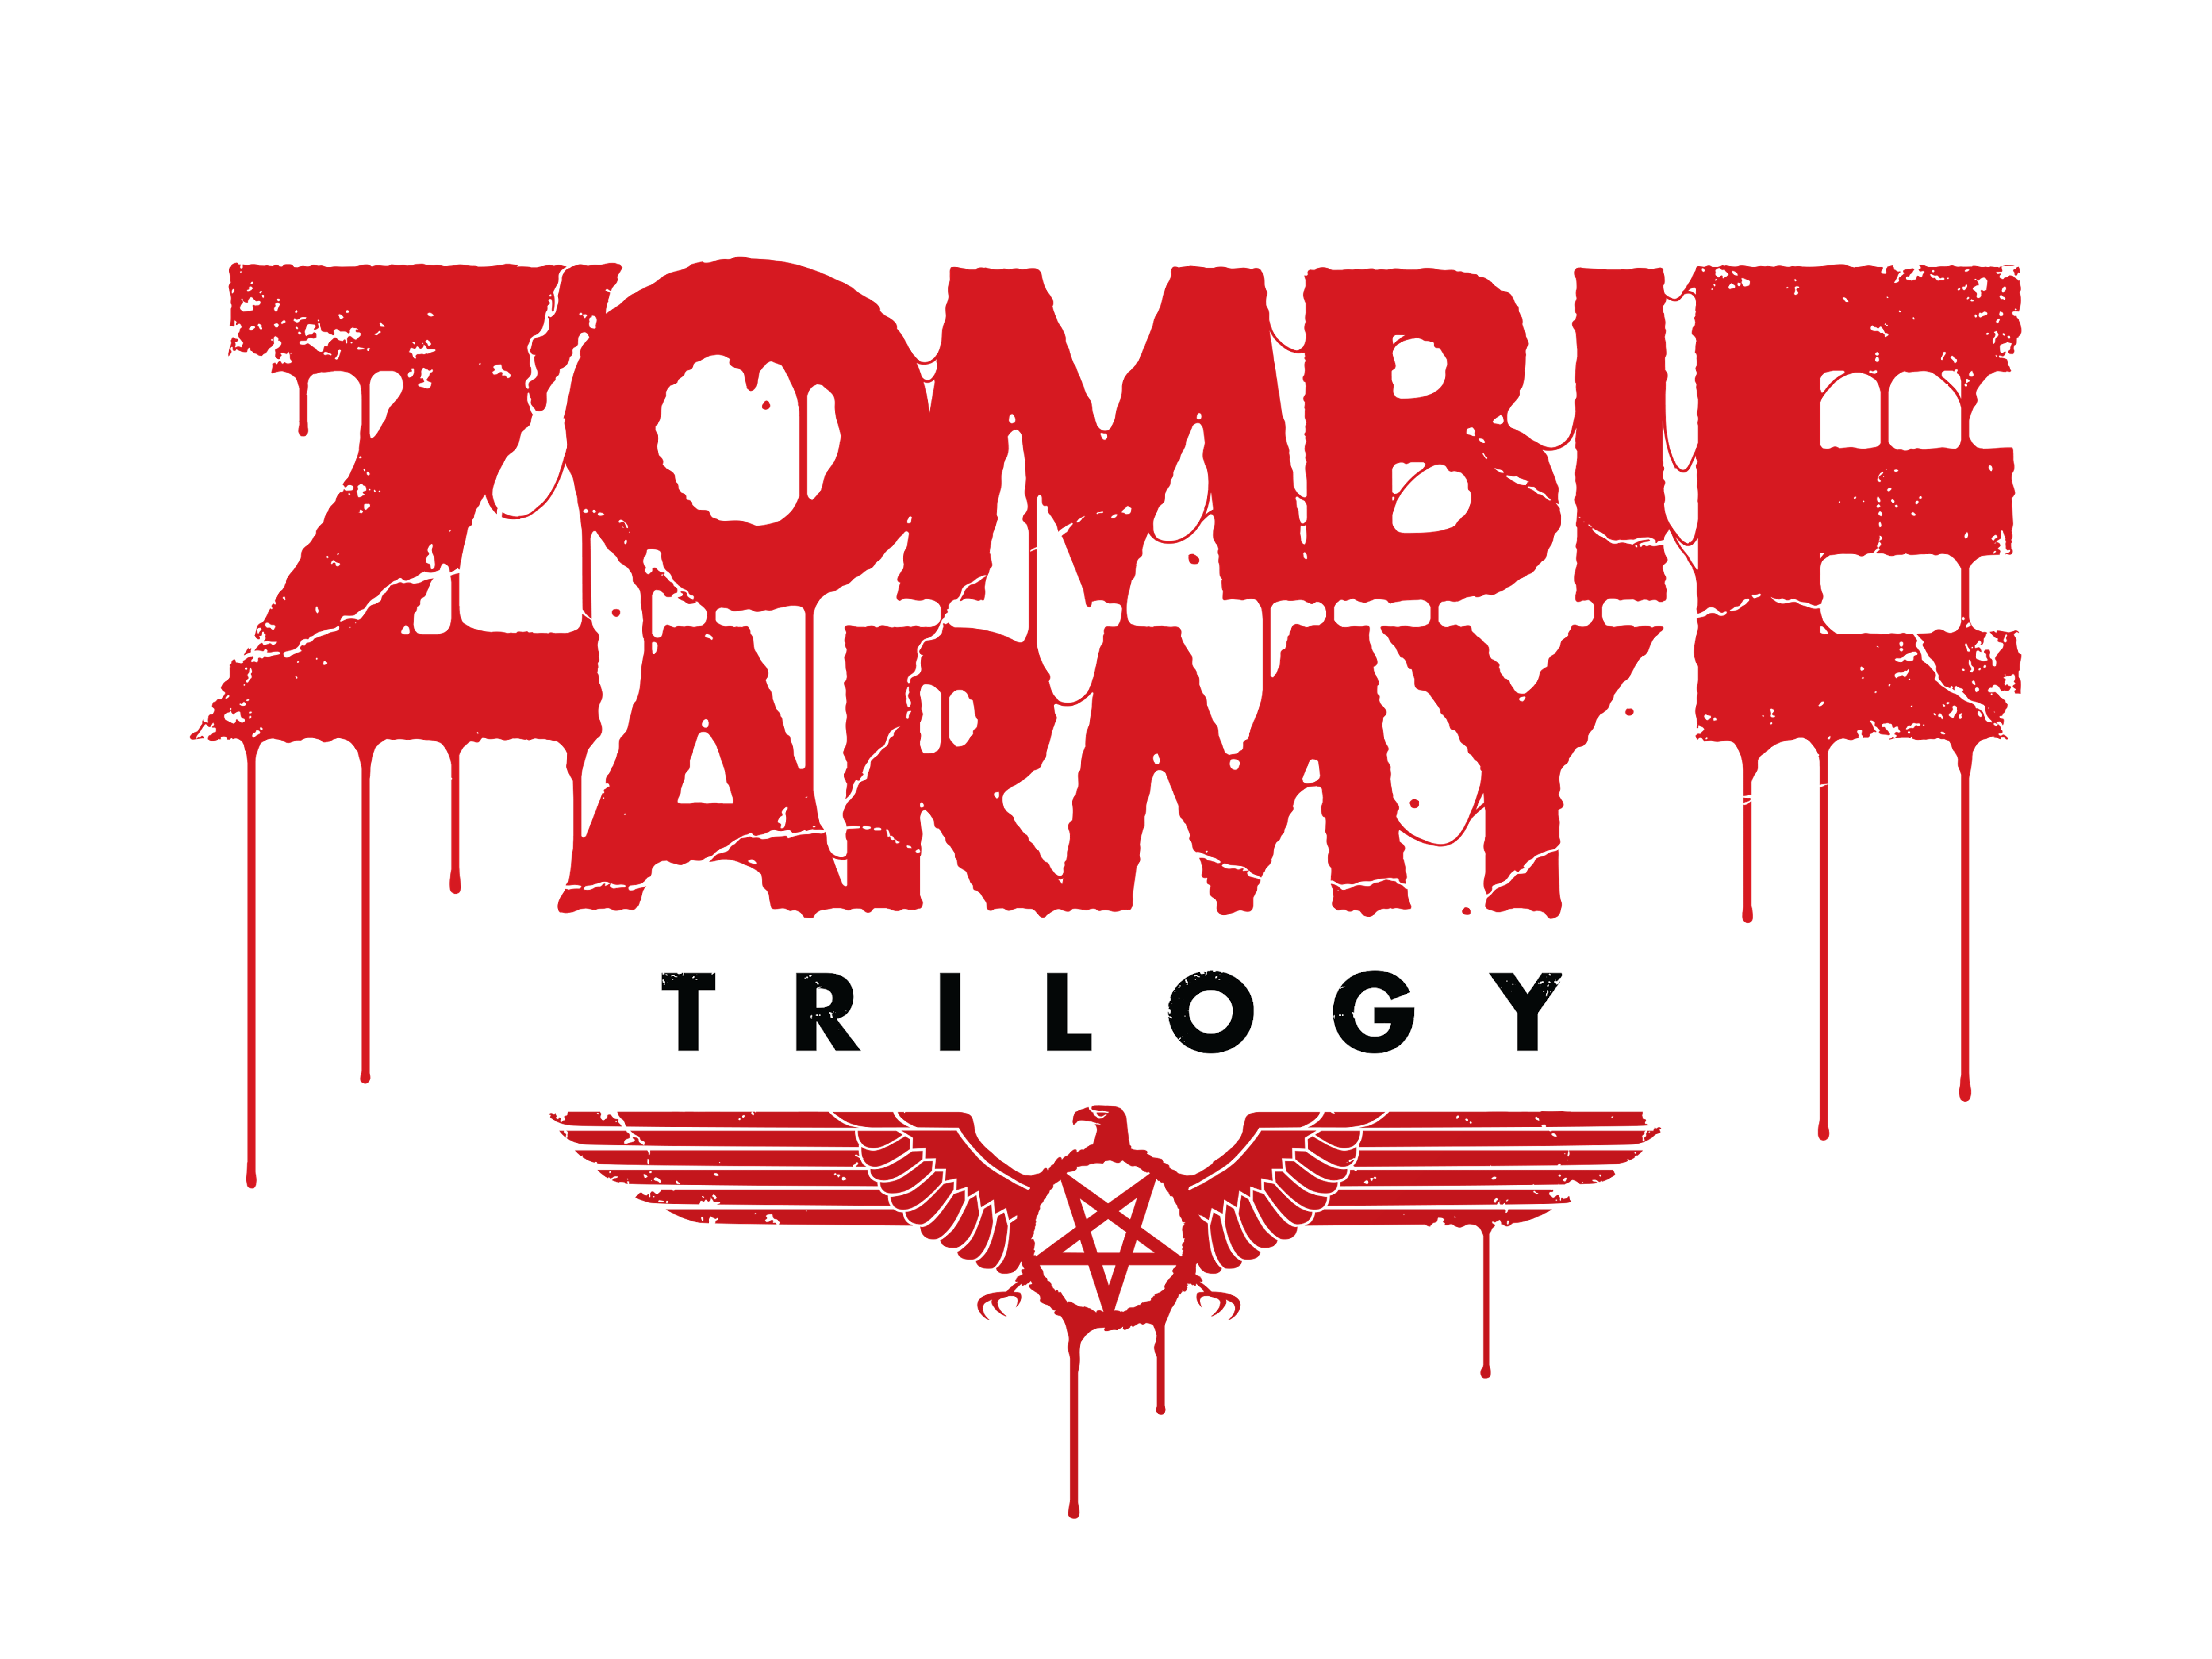 image zombie army trilogy logo png sniper elite wiki fandom rh sniperelitegame wikia com american sniper logos army sniper logos